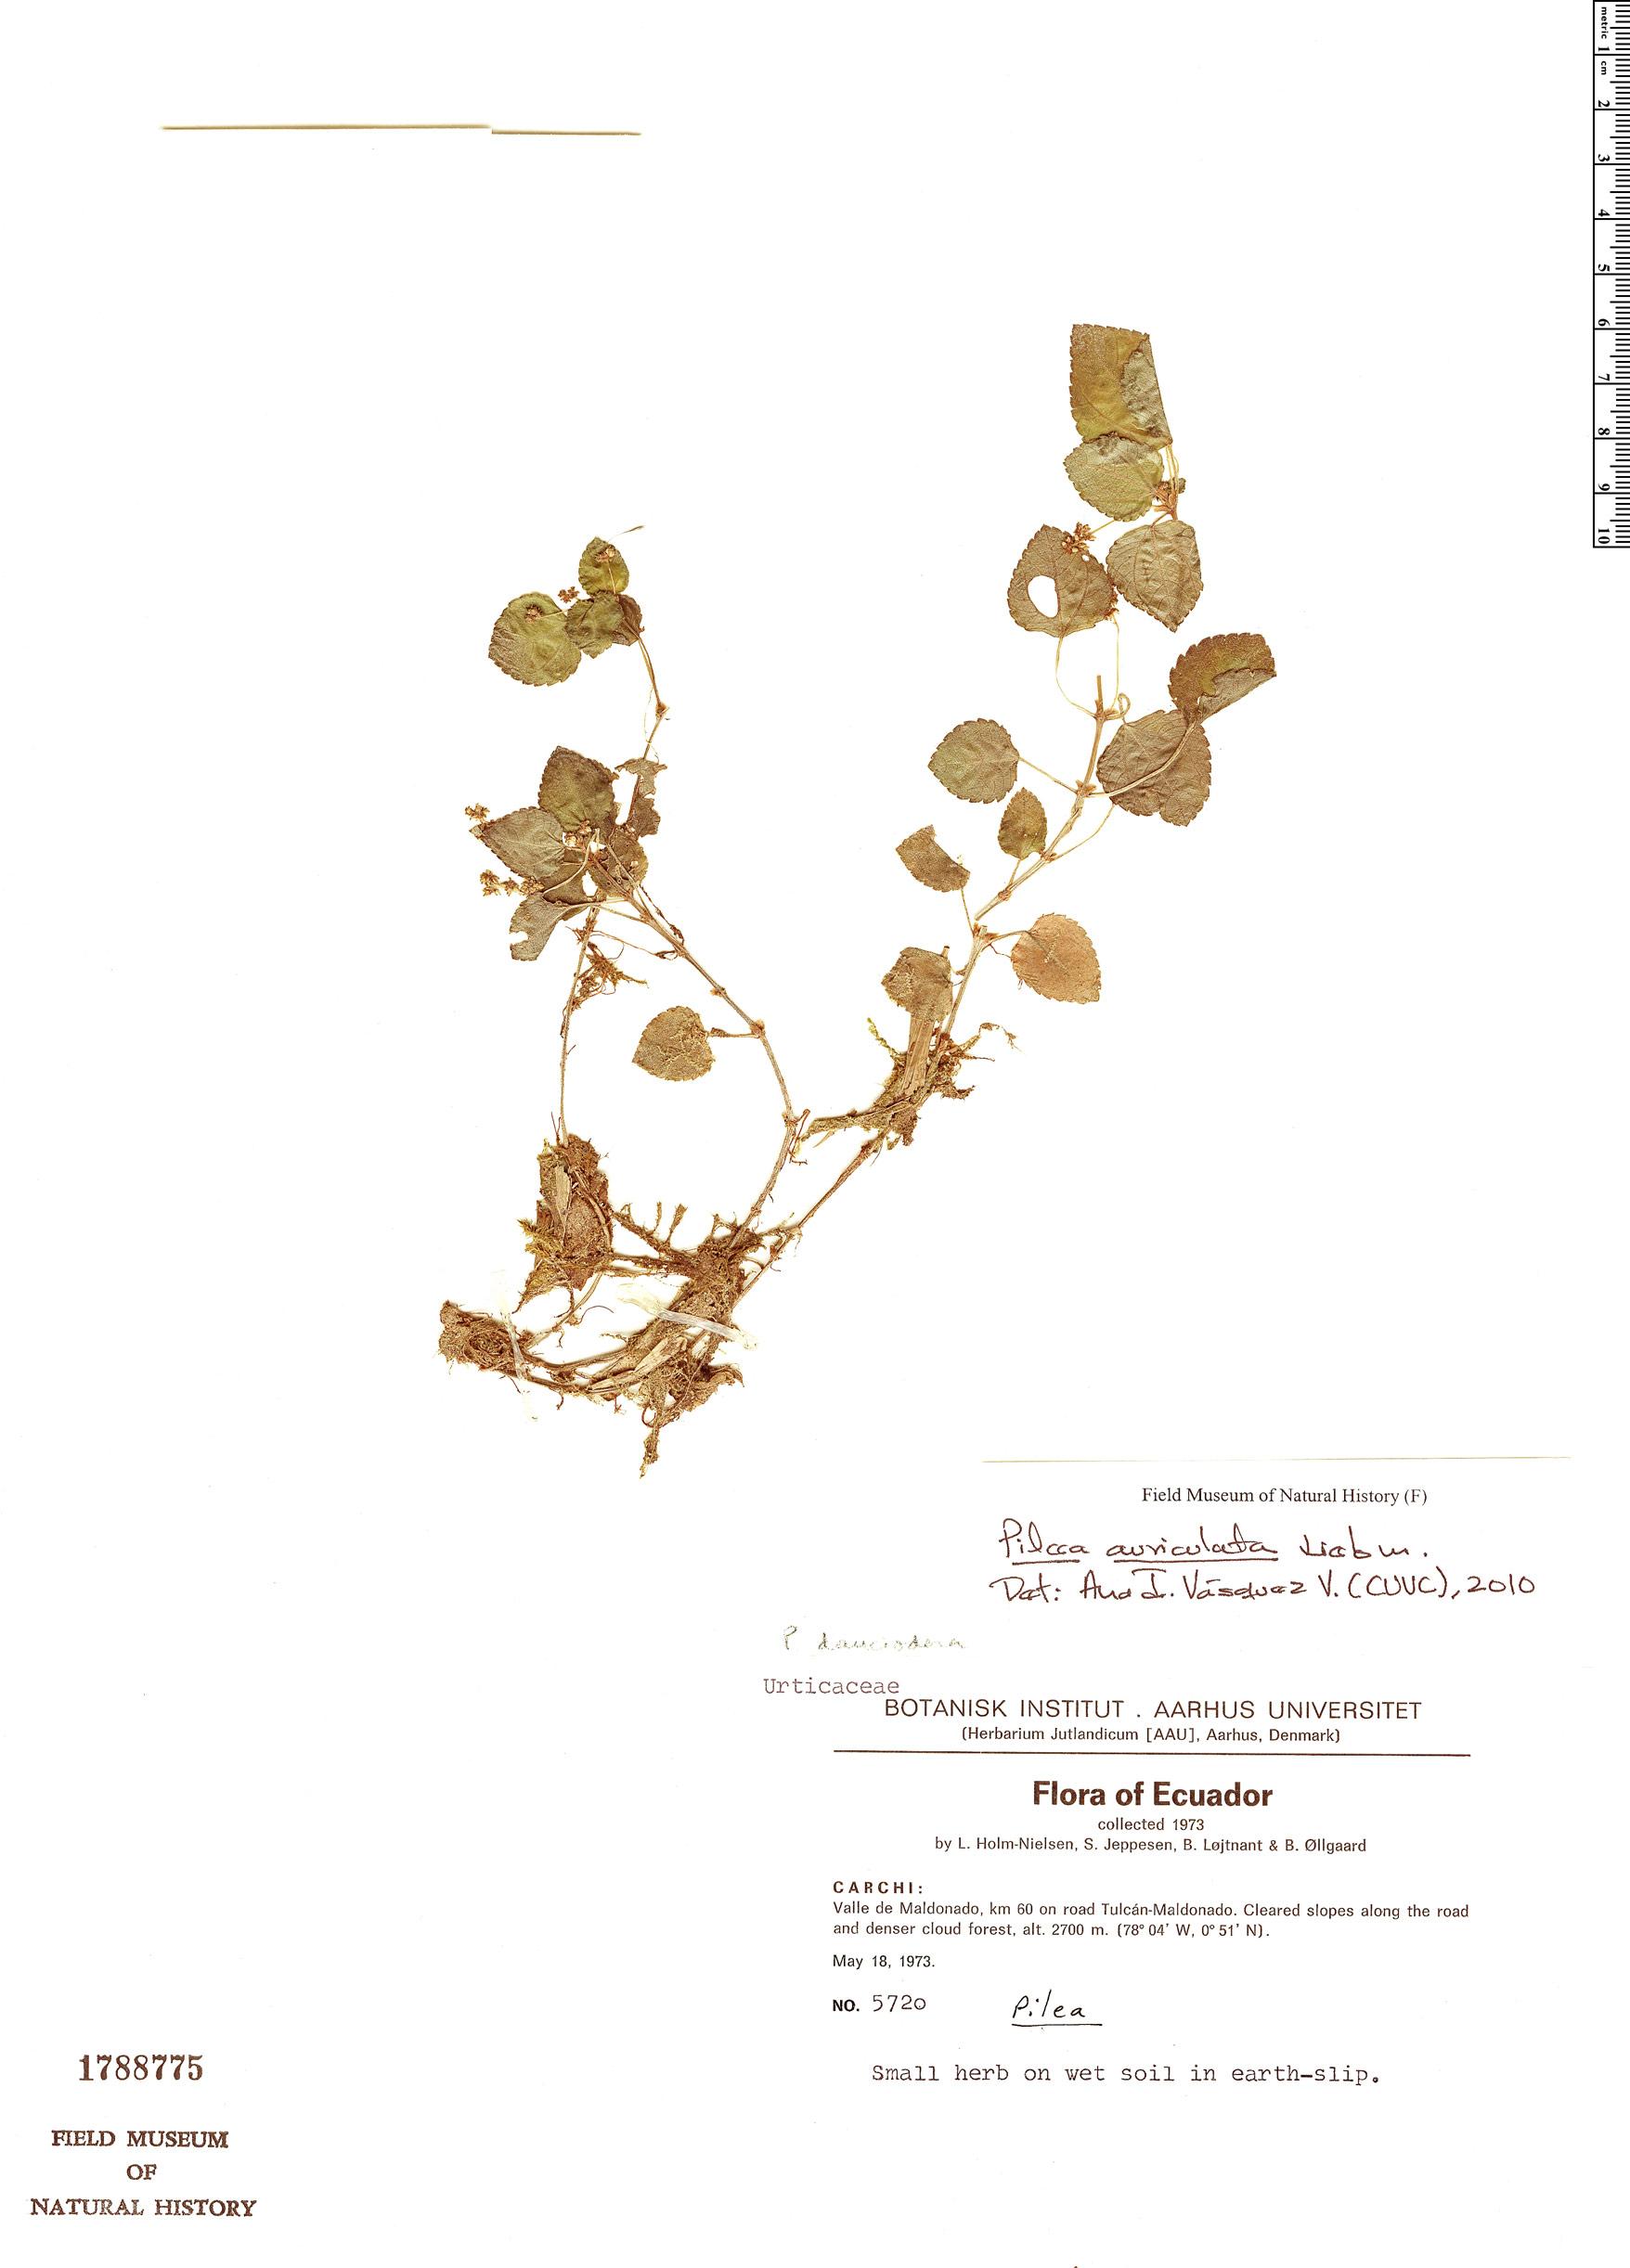 Specimen: Pilea auriculata